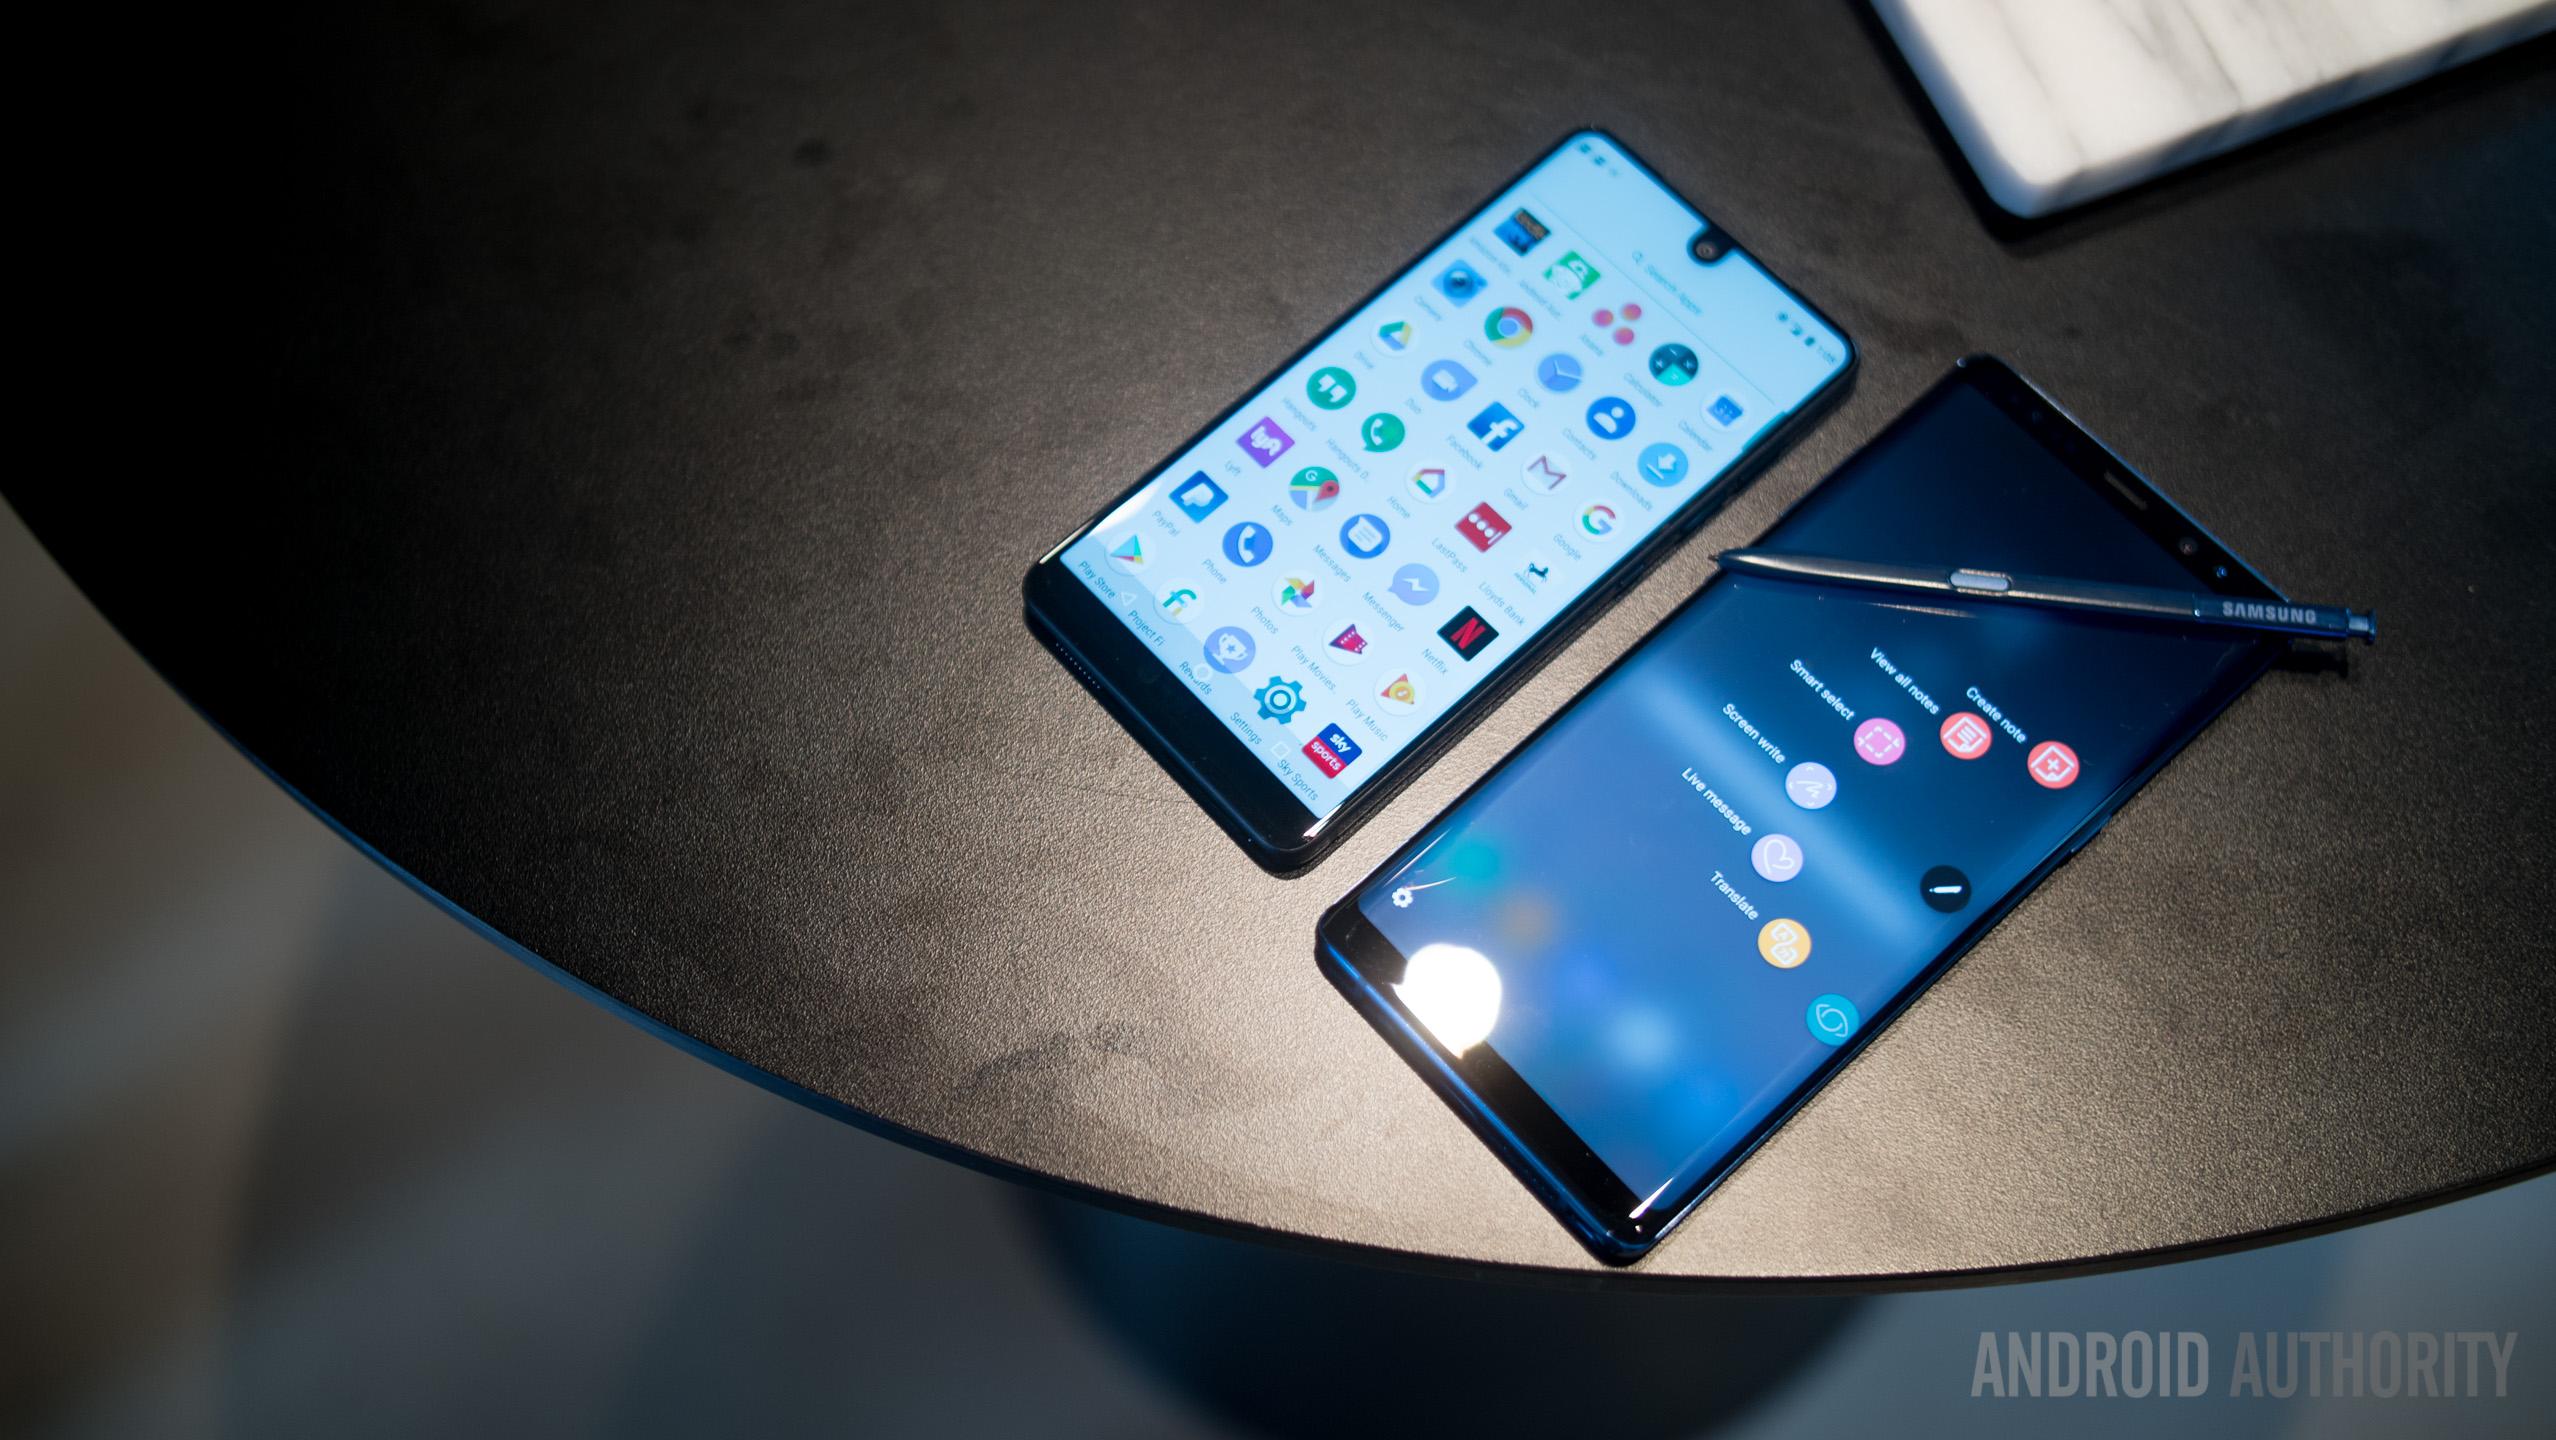 Samsung Galaxy Note 8 vs Essential Phone